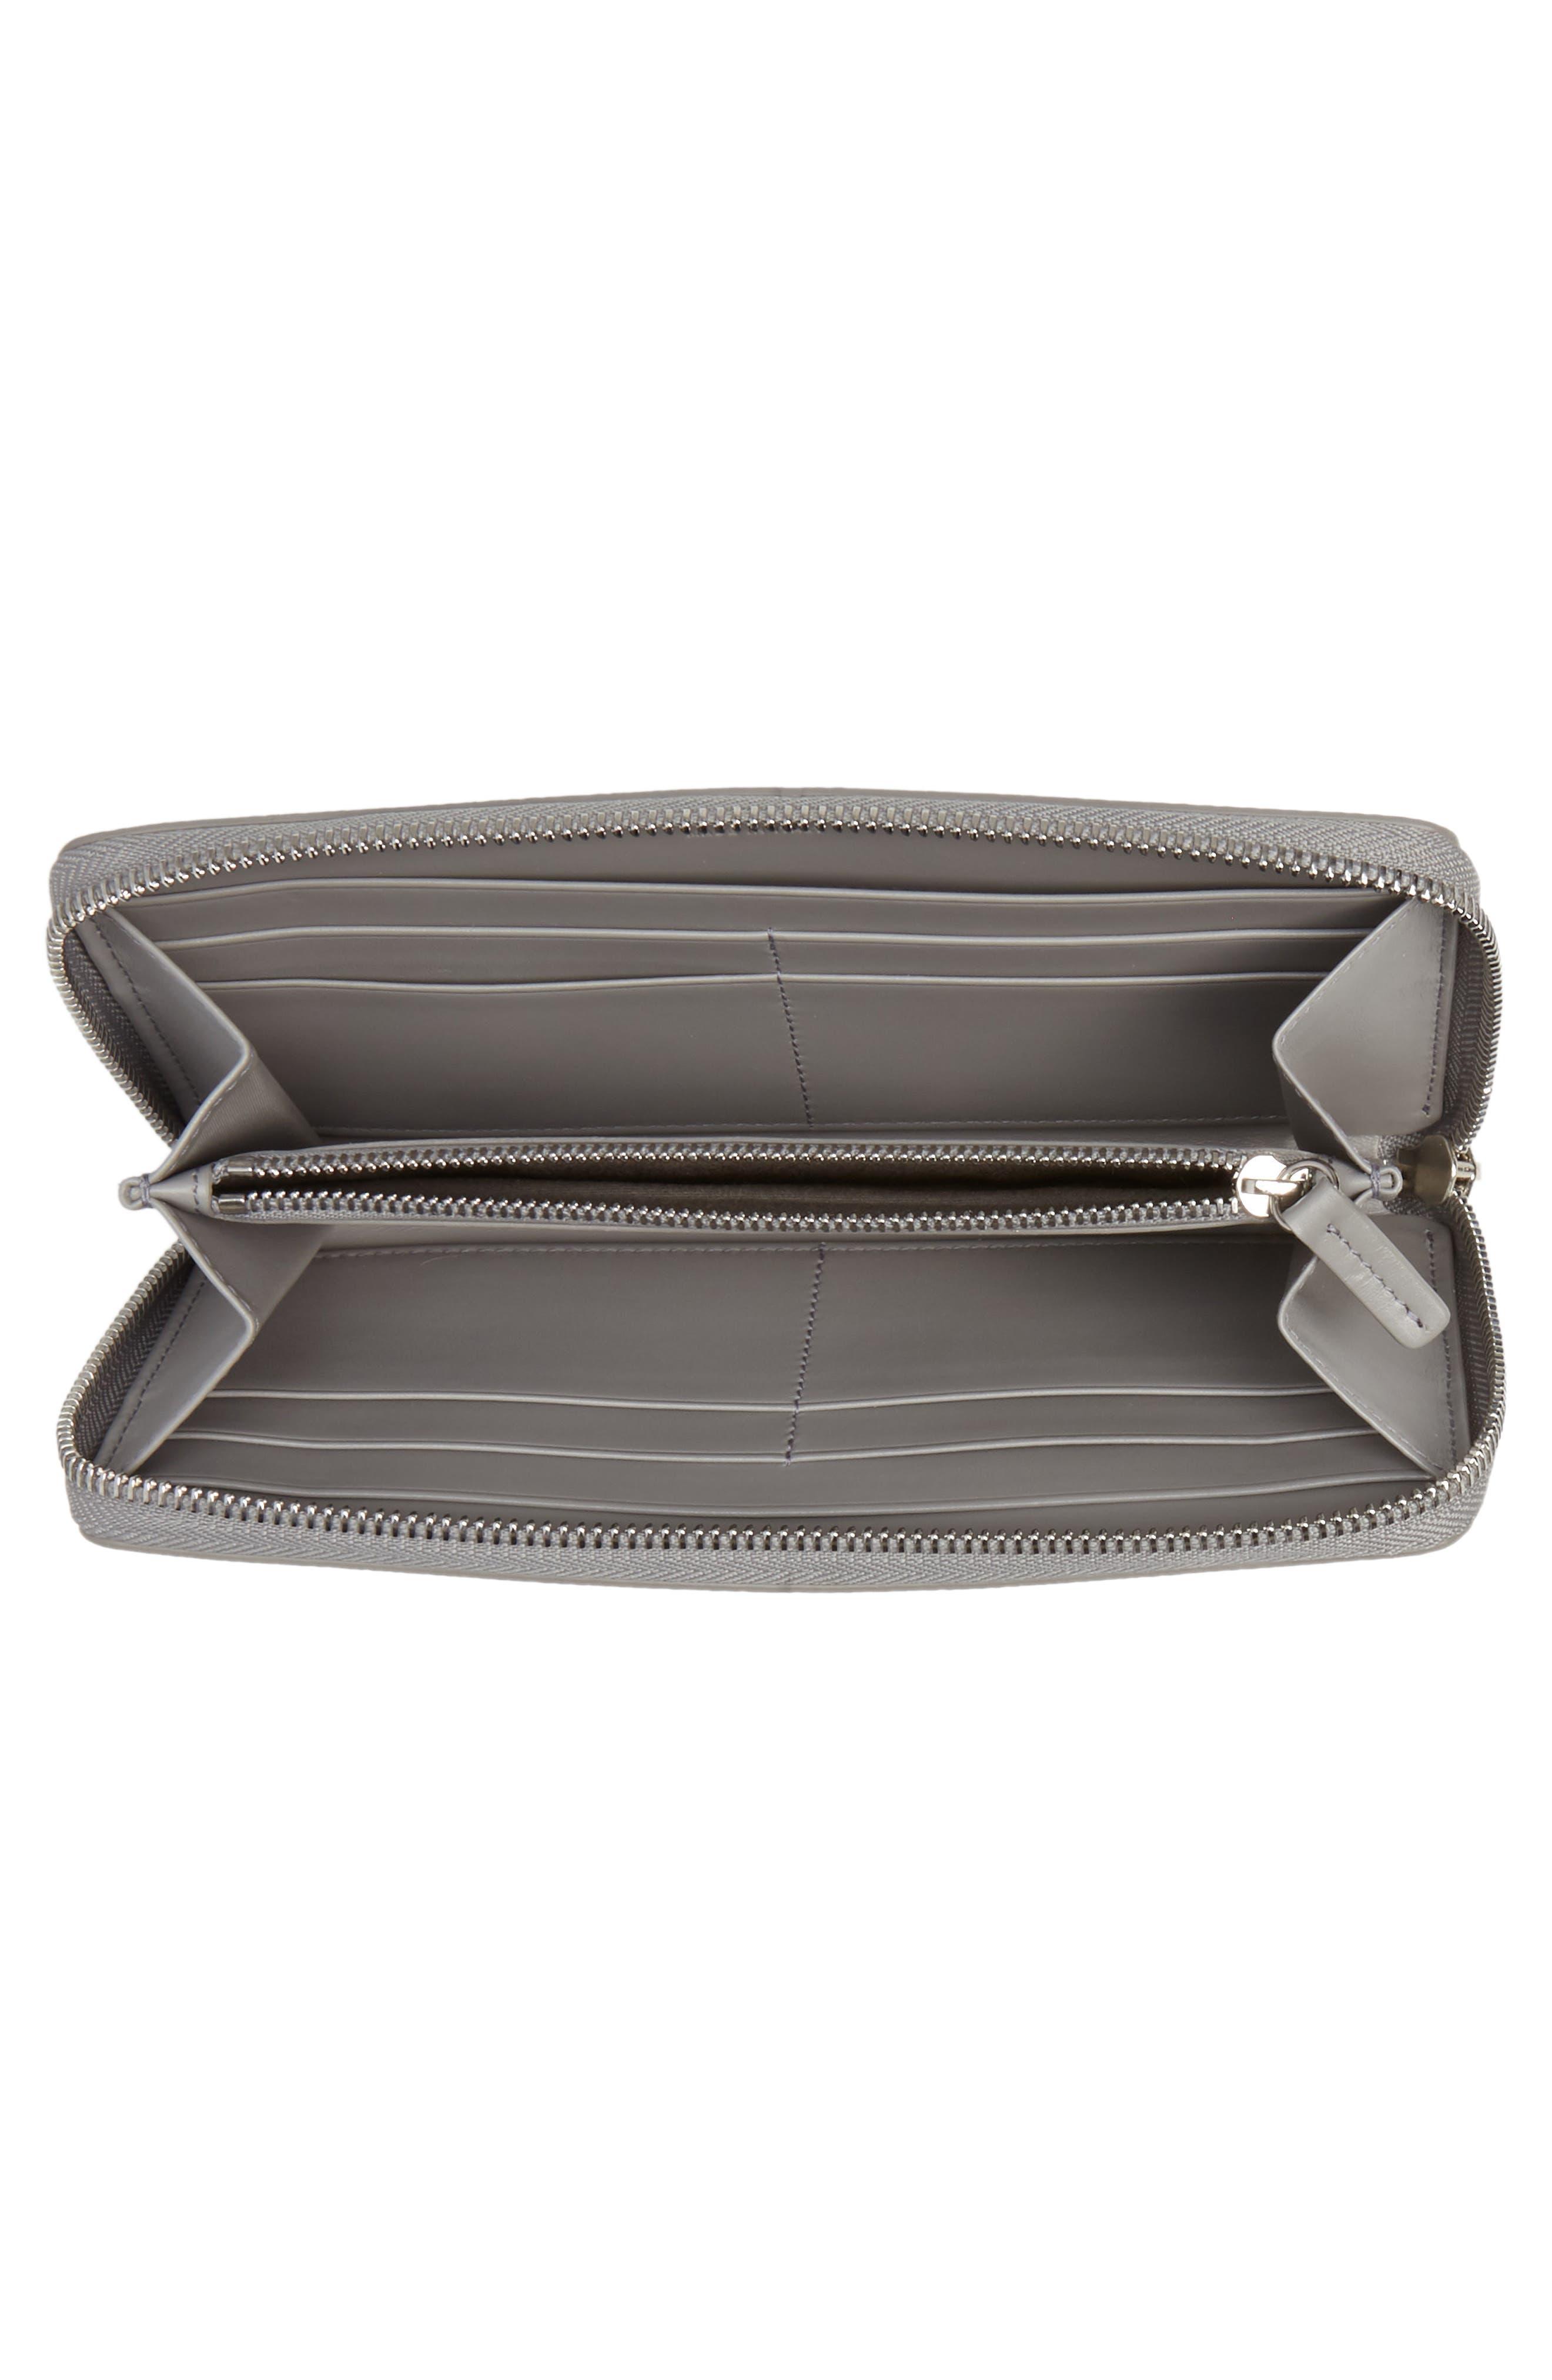 Large Panama Zip Around Wallet,                             Alternate thumbnail 4, color,                             020